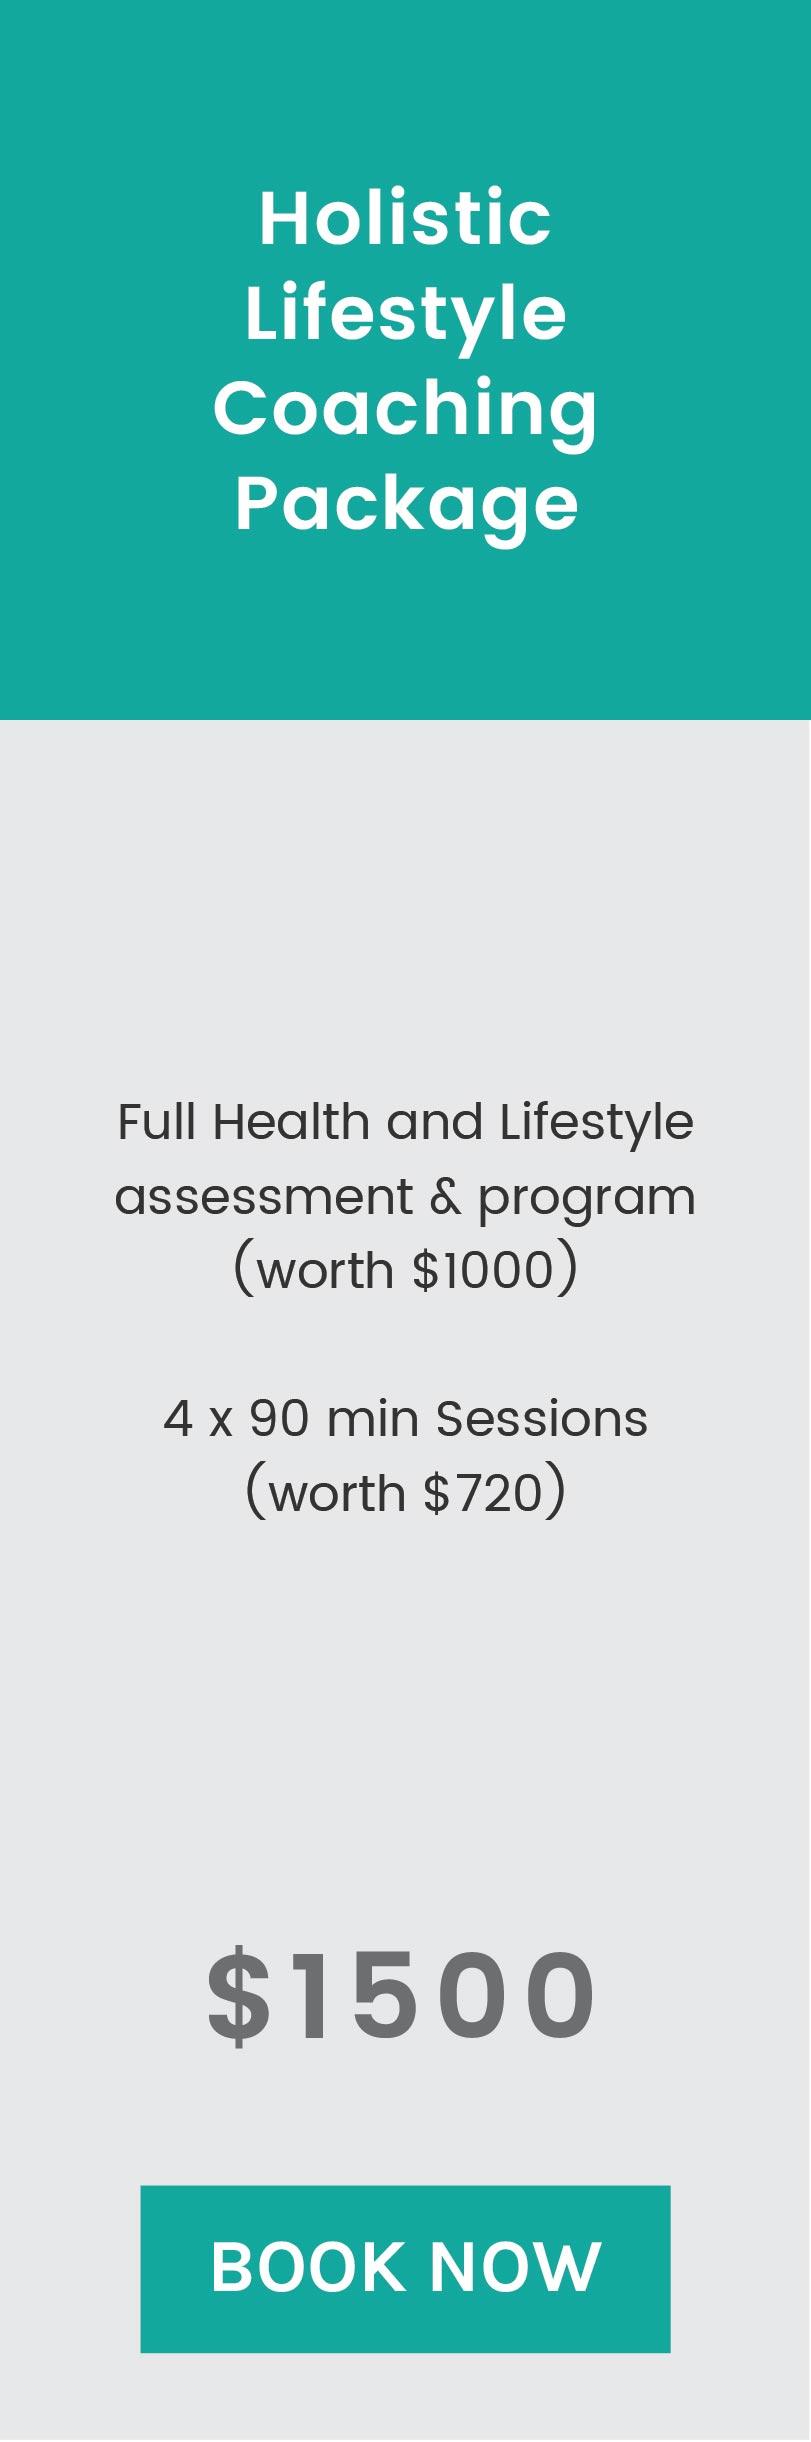 rhythm-health-package-graphic1-05.jpg